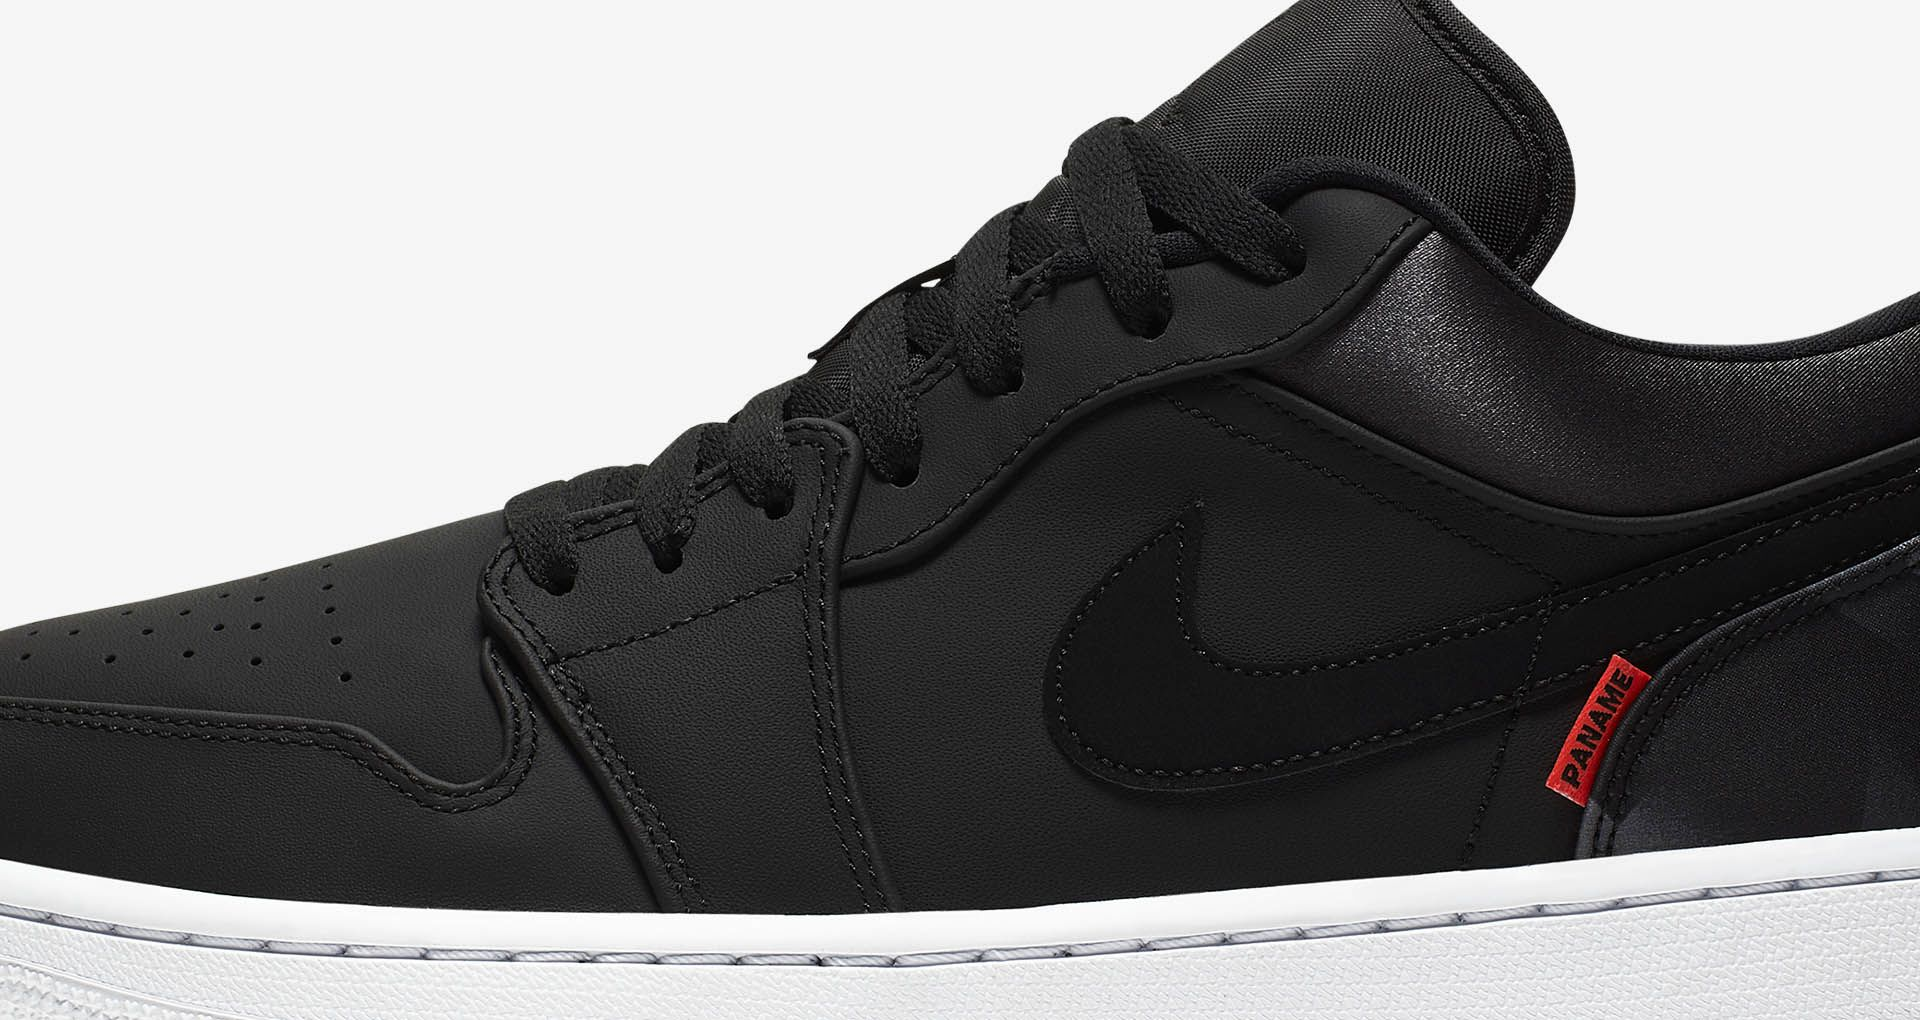 Date de sortie de la Air Jordan 1 Low « PSG ». Nike SNEAKRS FR